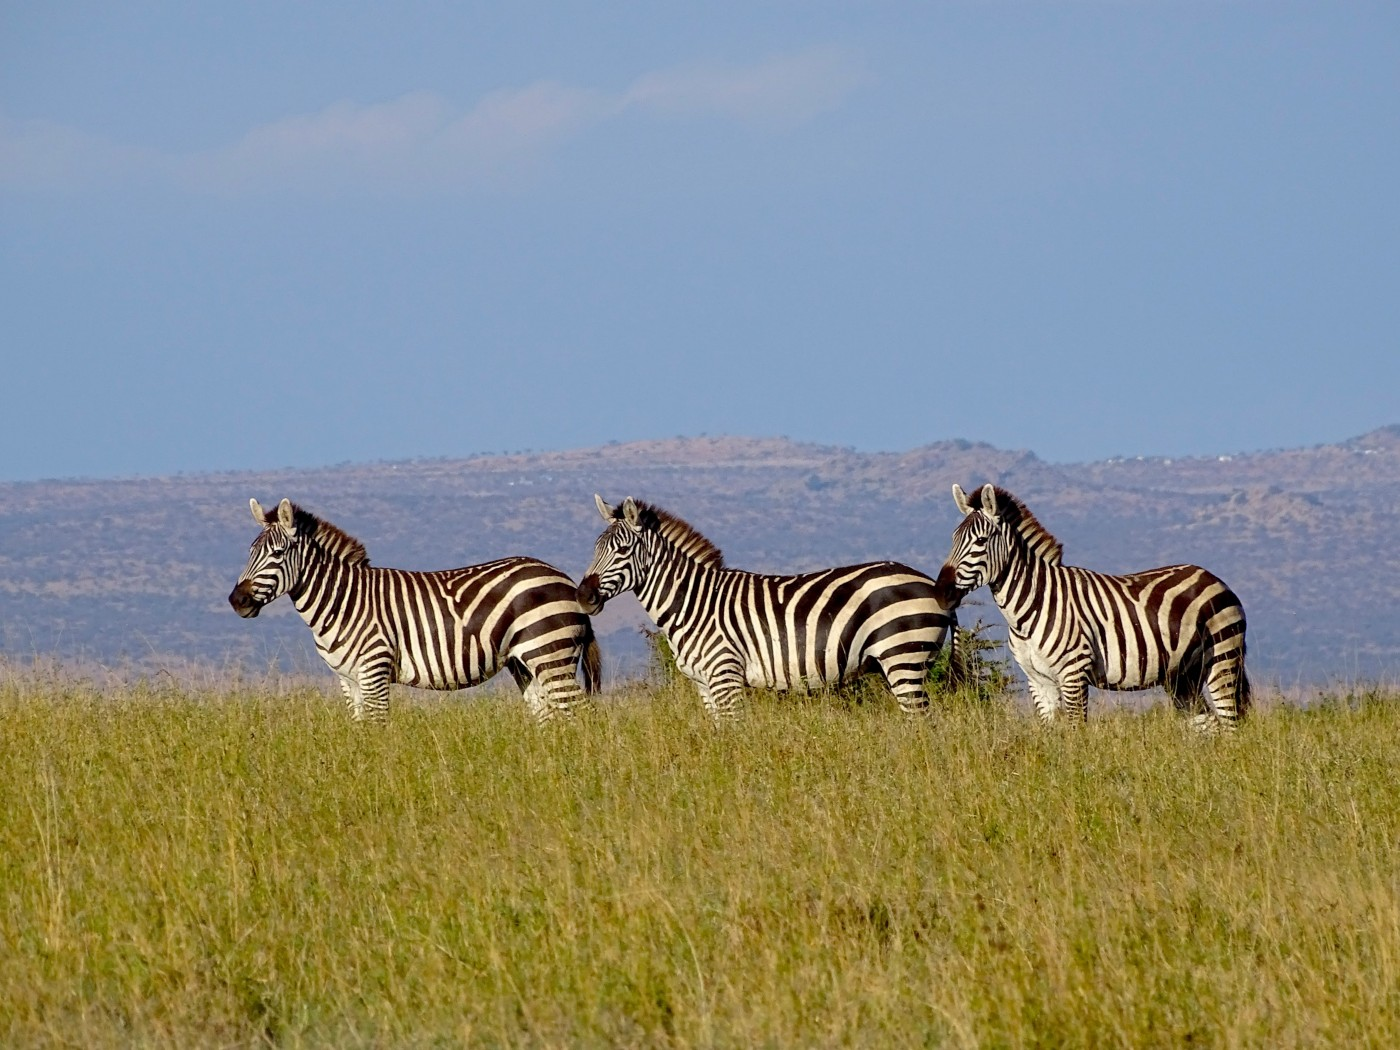 Growing Livestock Numbers Threaten One of the Last Refuges for Large Wild Herbivores in Kenya